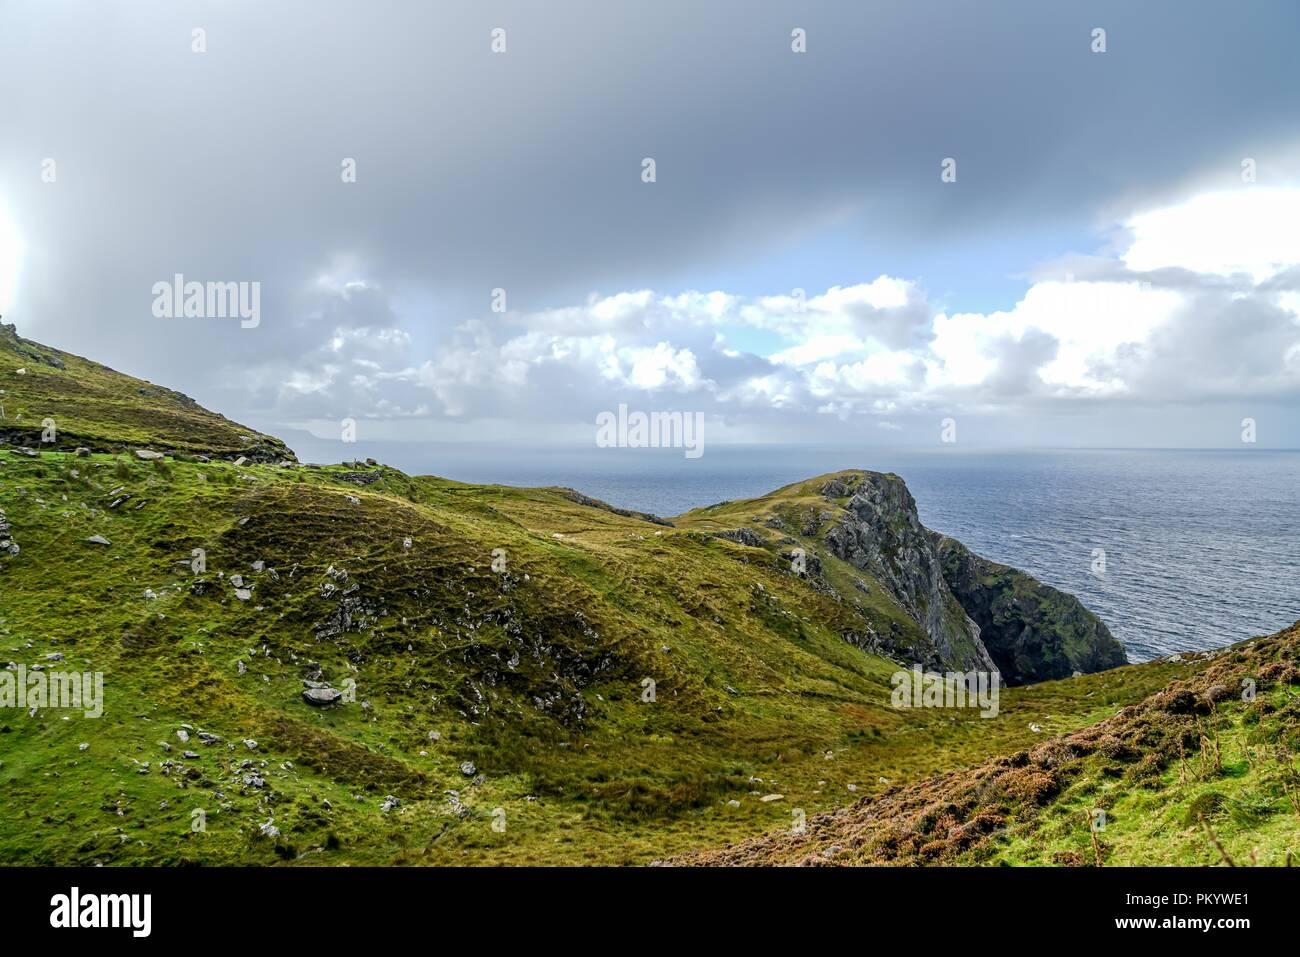 The amazing cliffs of Slieve League near Carrick Ireland. Stock Photo